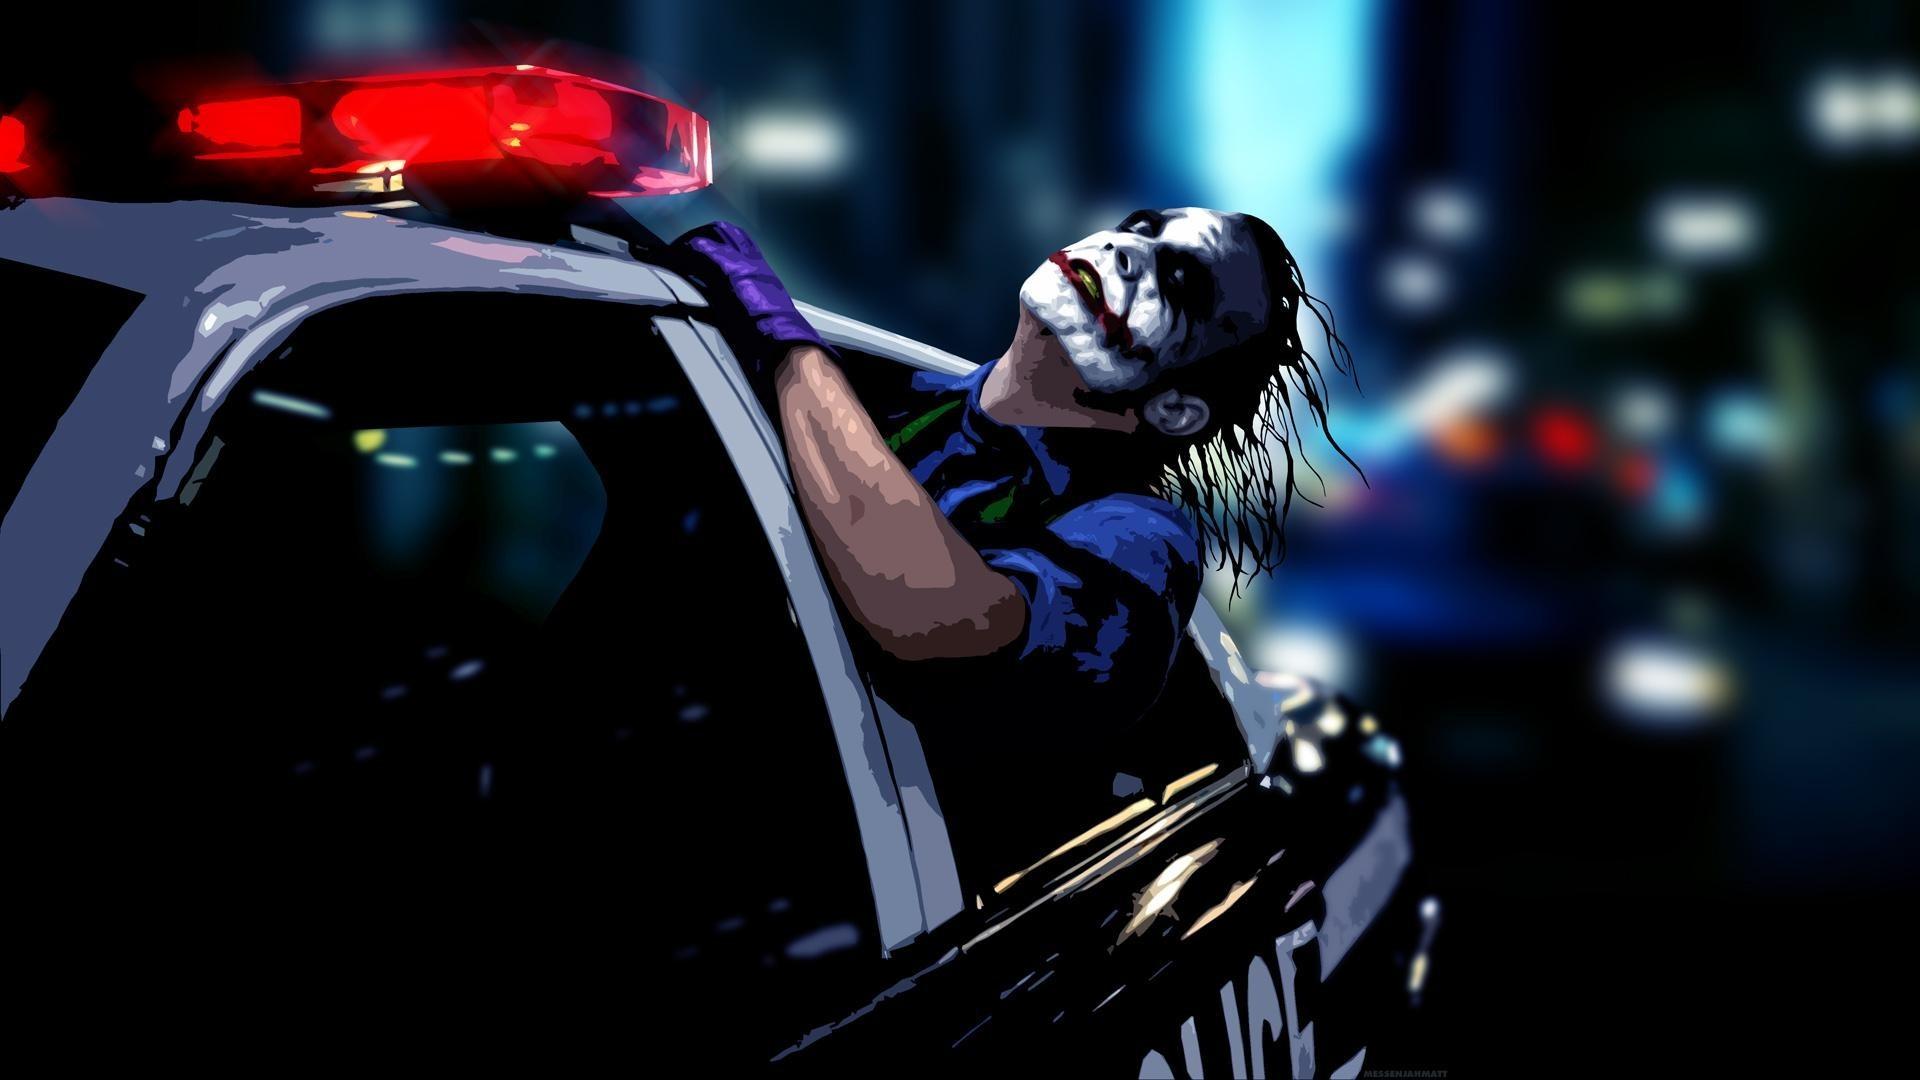 Batman Joker HD Wallpaper